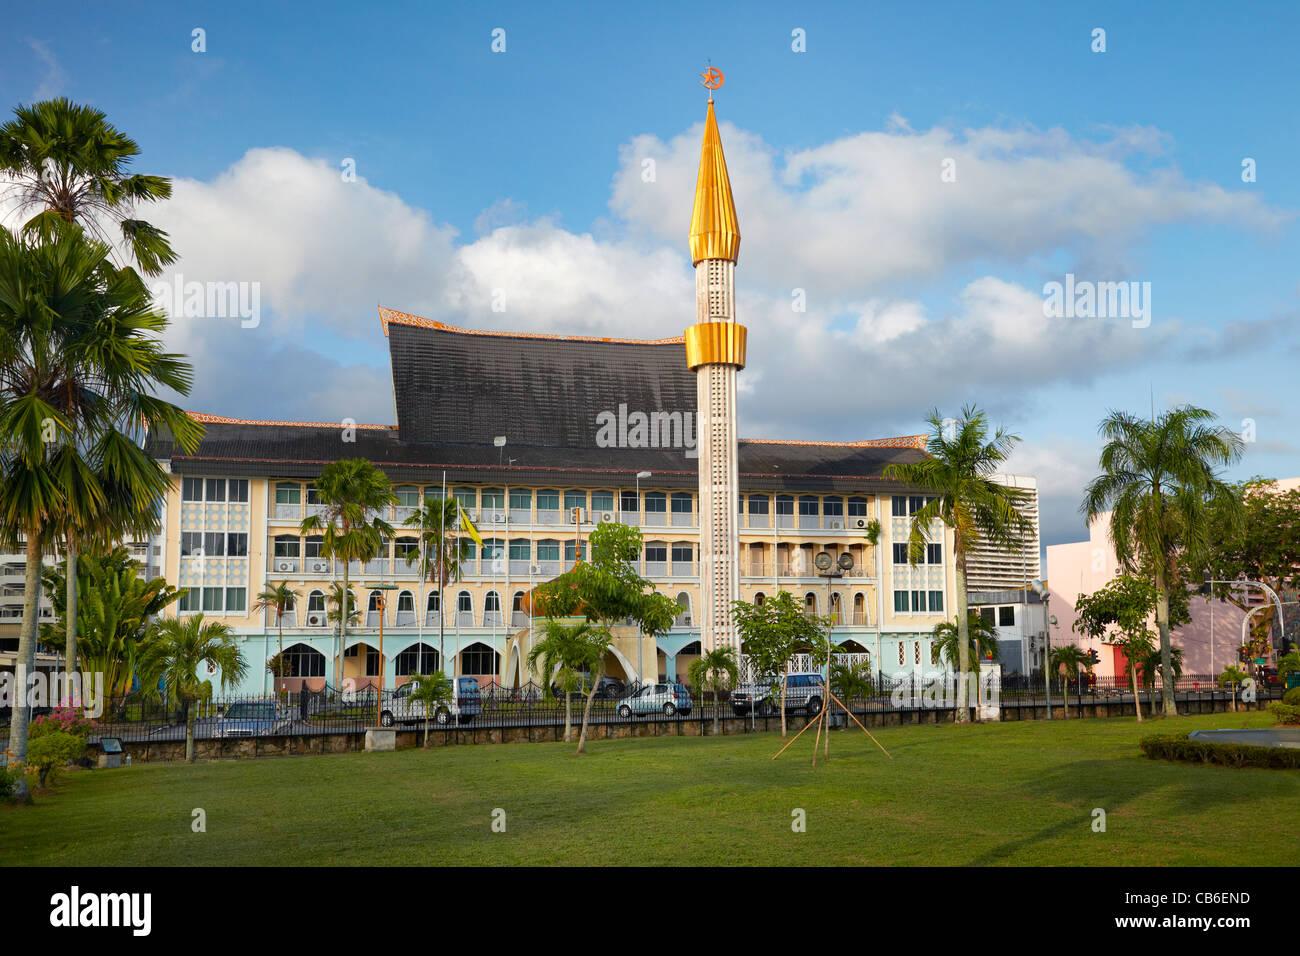 Ministry of Religious Islamic Affairs, Bandar Seri Begawan, Brunei Darussalam, Borneo, Asia - Stock Image